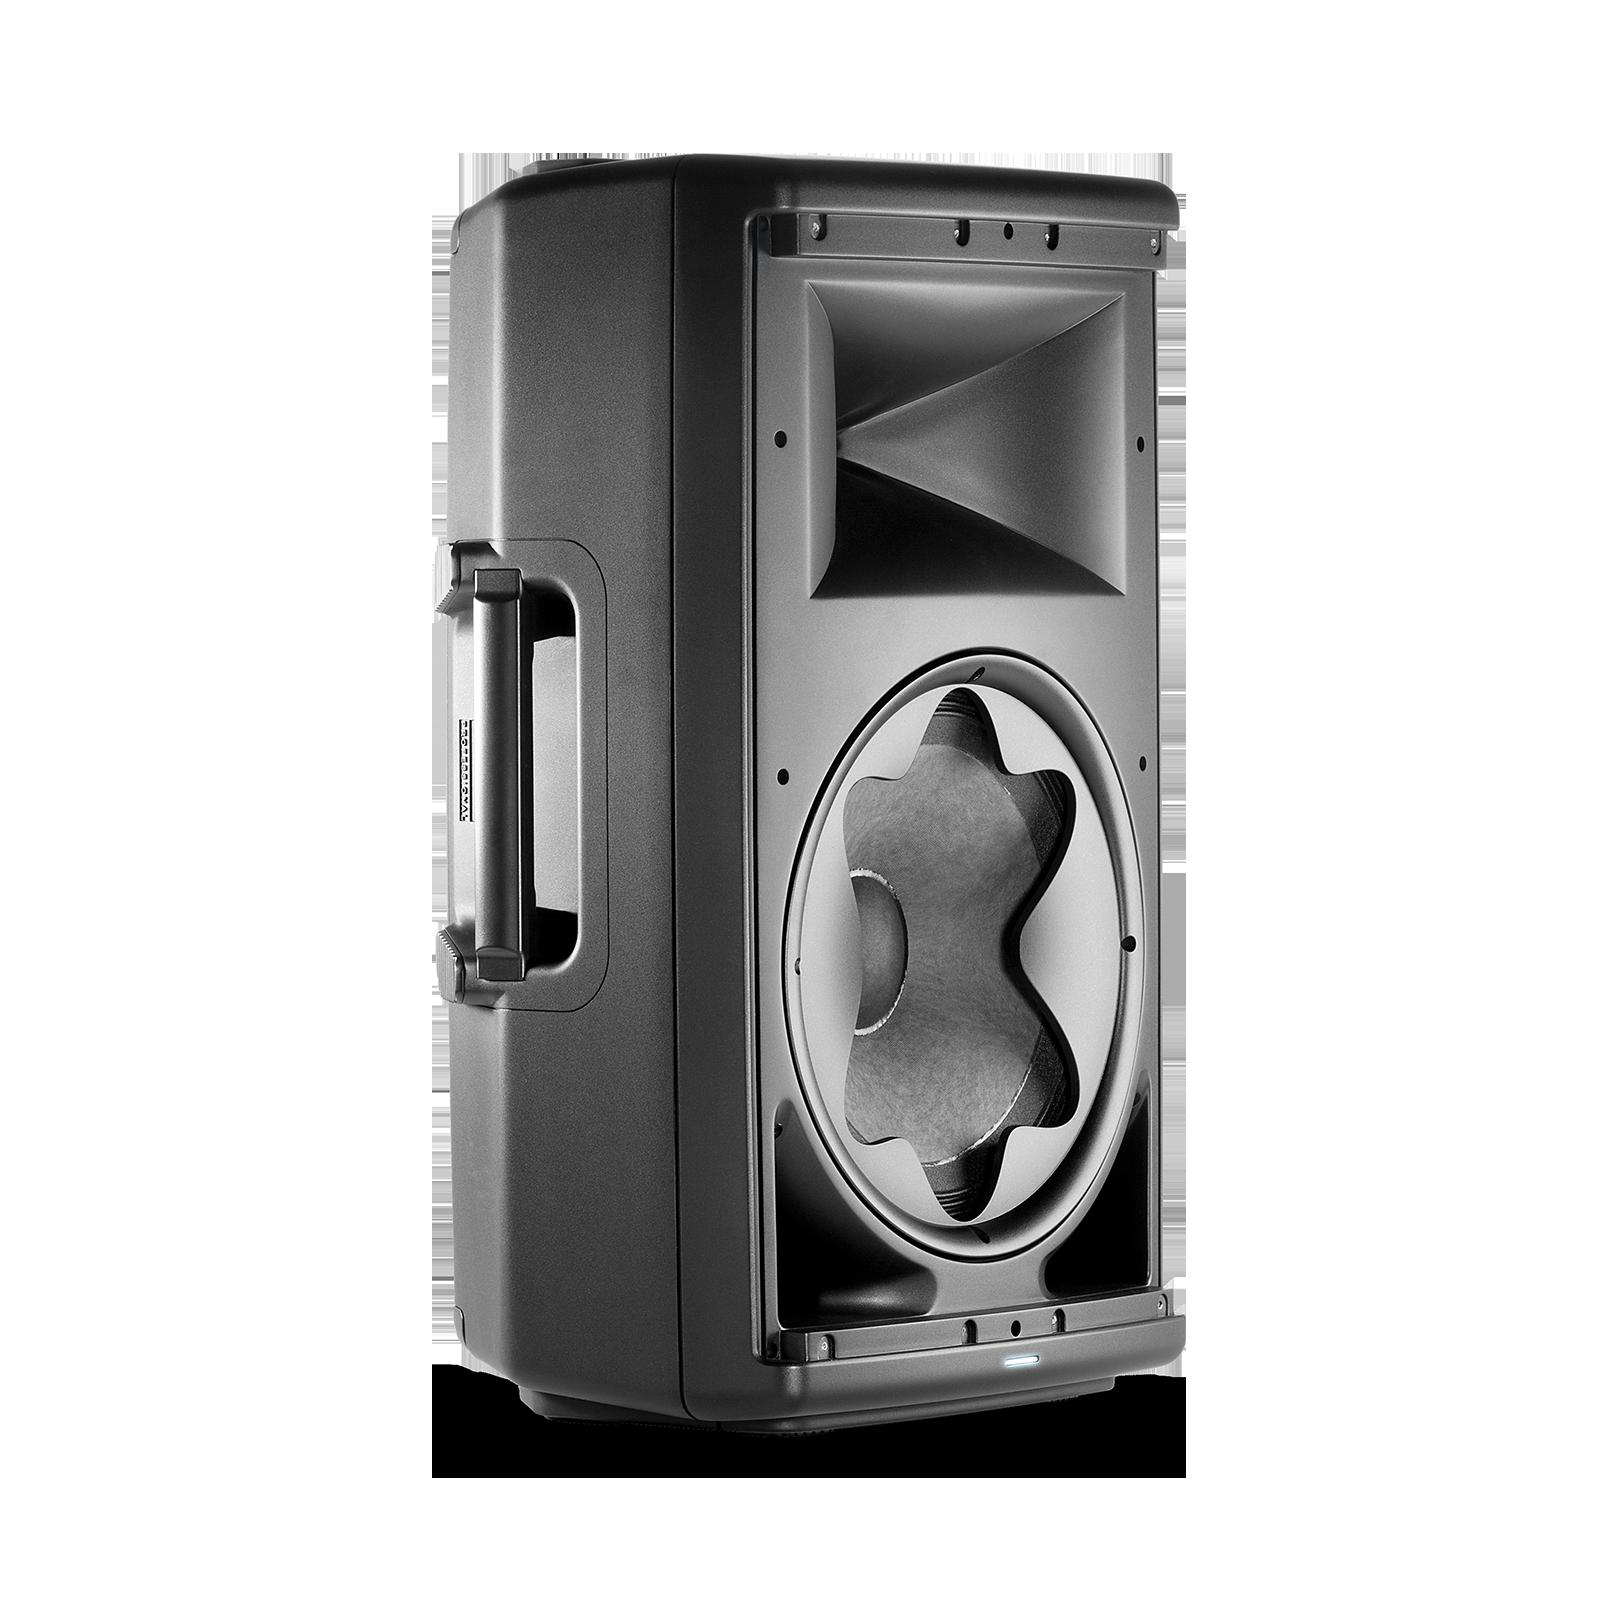 "JBL EON612 - Black - 12"" (30.48 cm) Two-Way Multipurpose Self-Powered Sound Reinforcement - Detailshot 2"